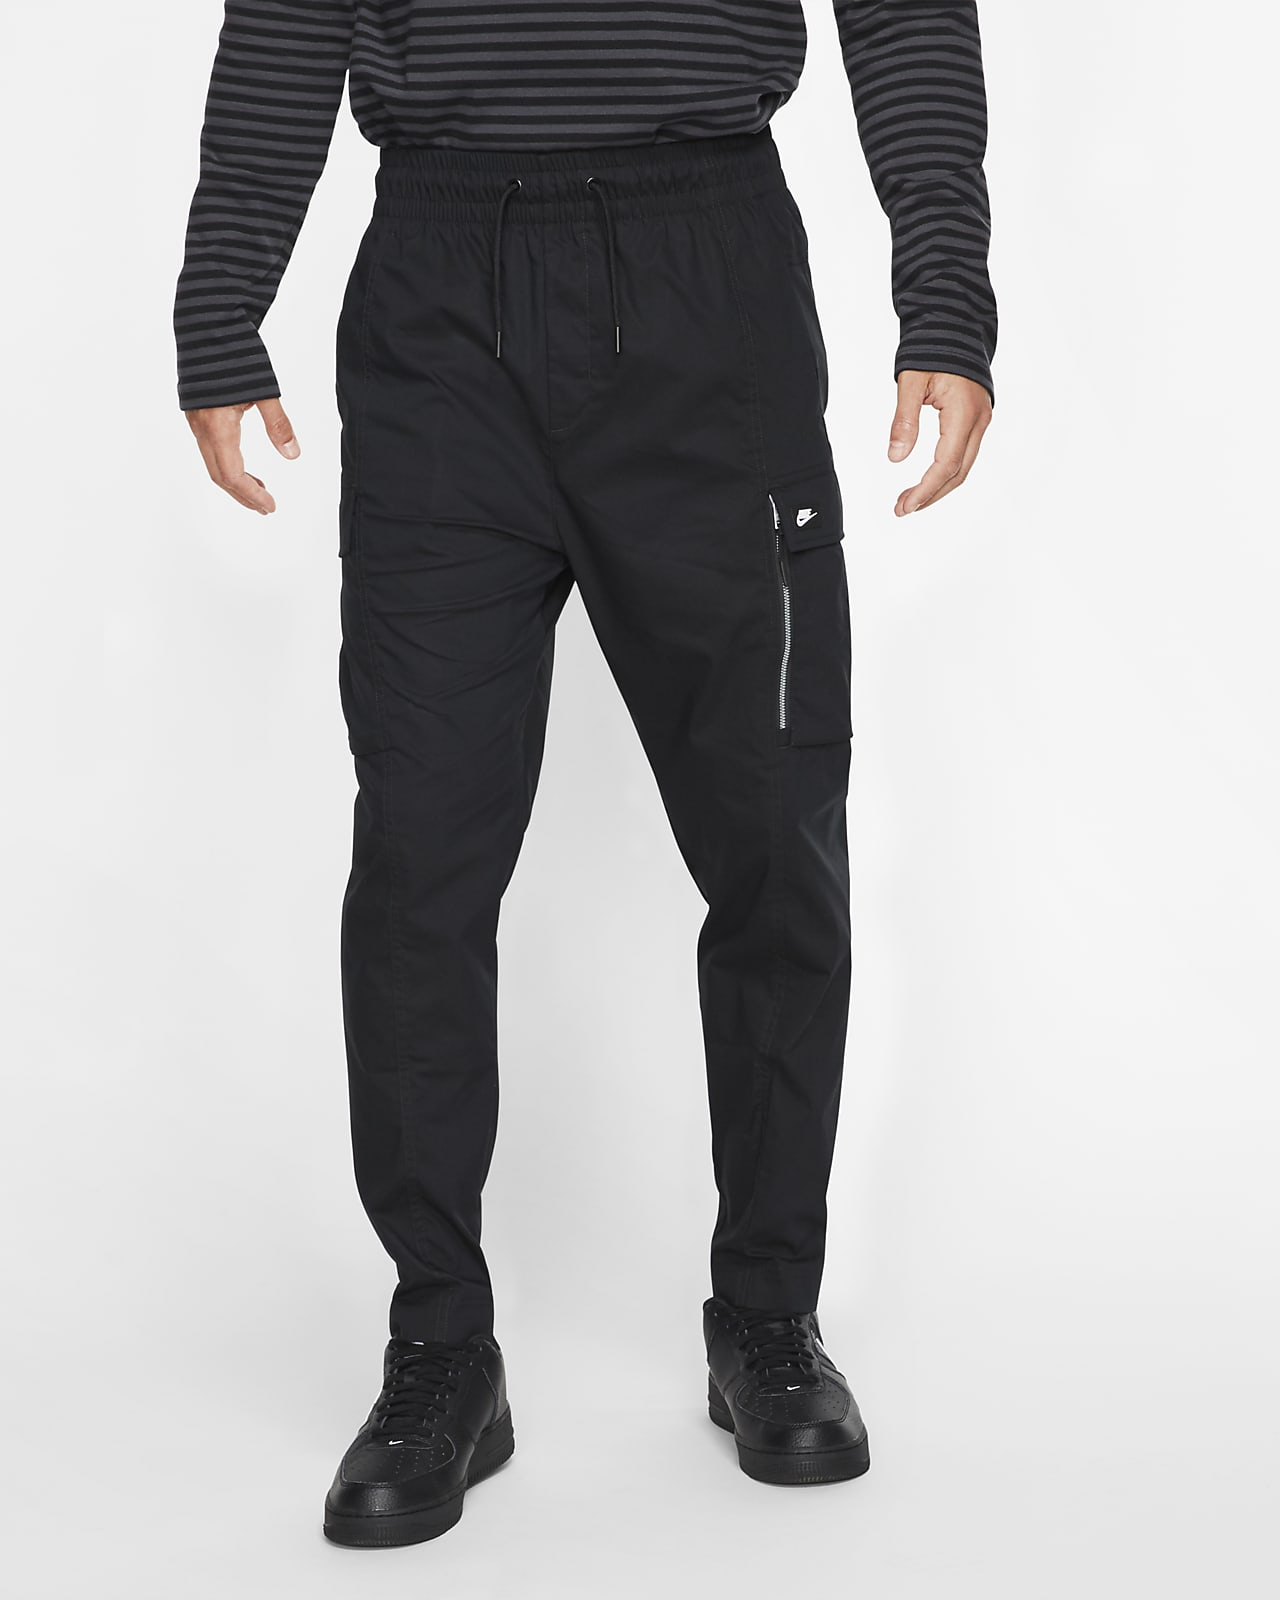 Consentimiento Florecer Tender  Nike Sportswear Men's Cargo Pants. Nike.com